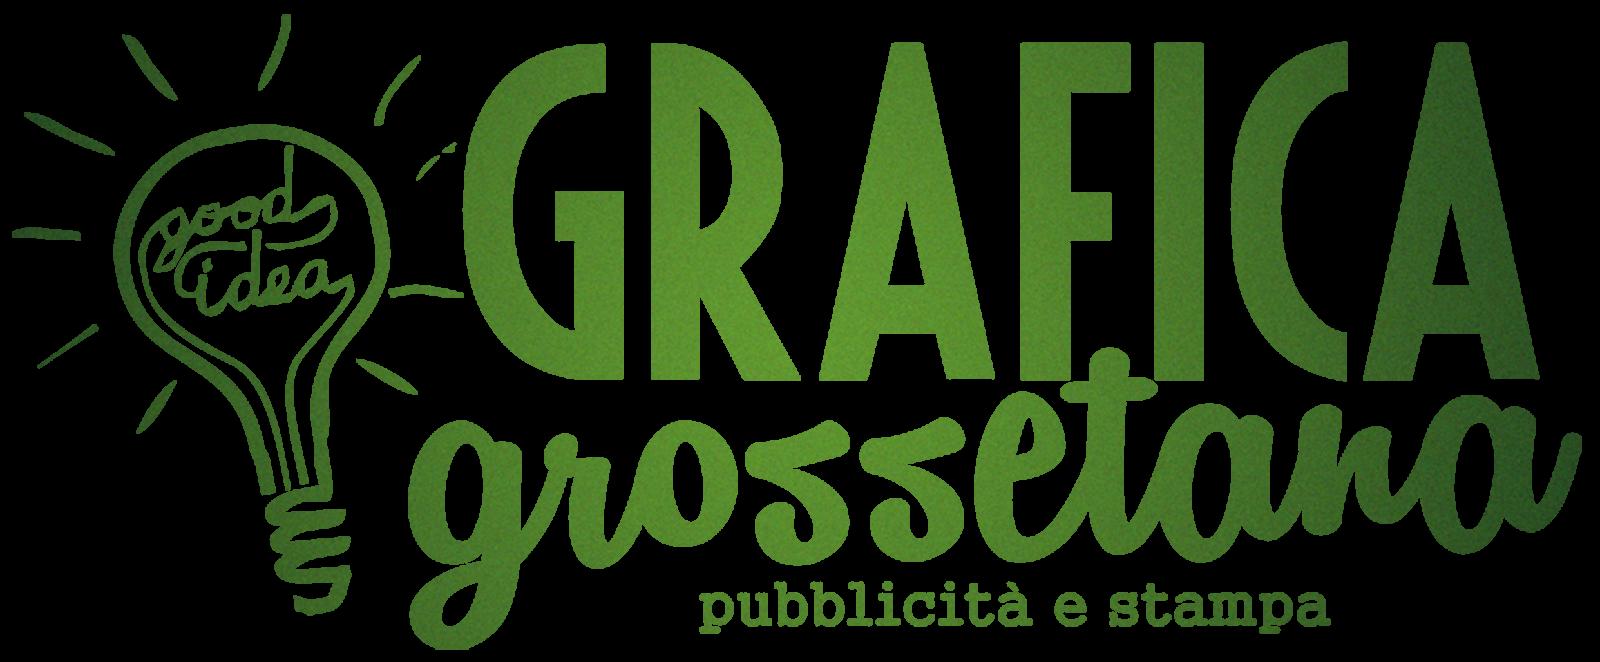 Grafica Grossetana